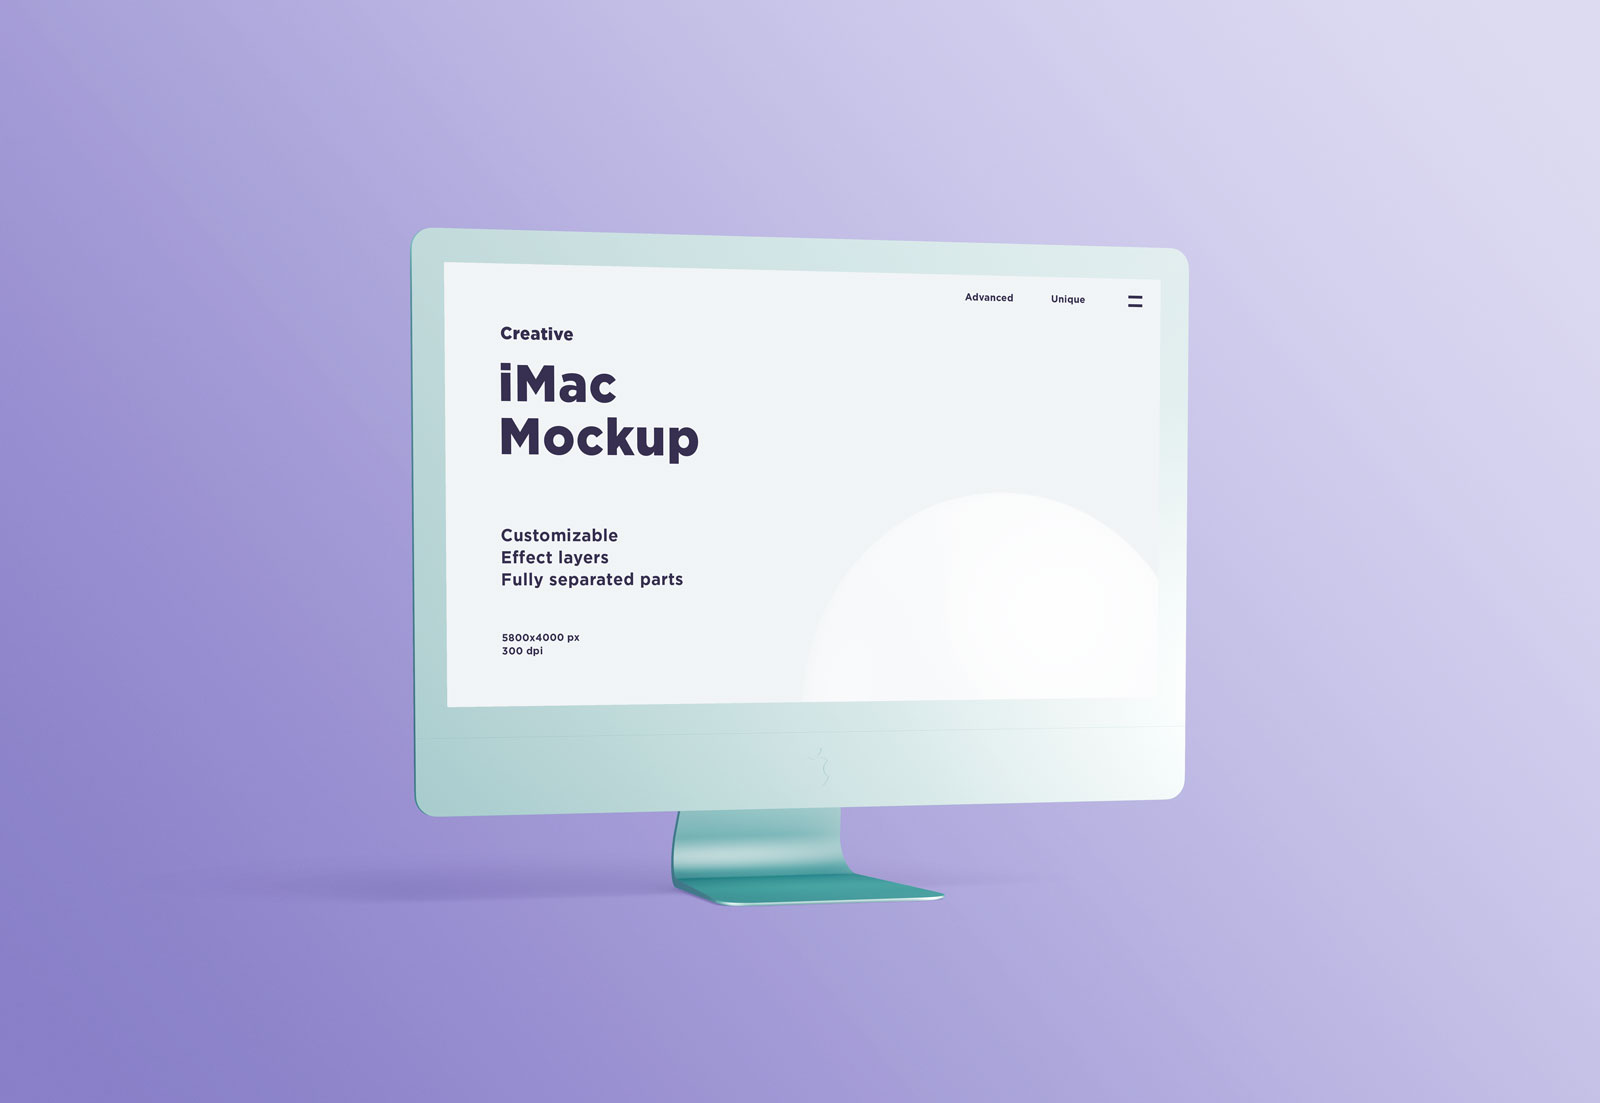 Free-Fully-Customizable-iMac-Mockup-PSD-3